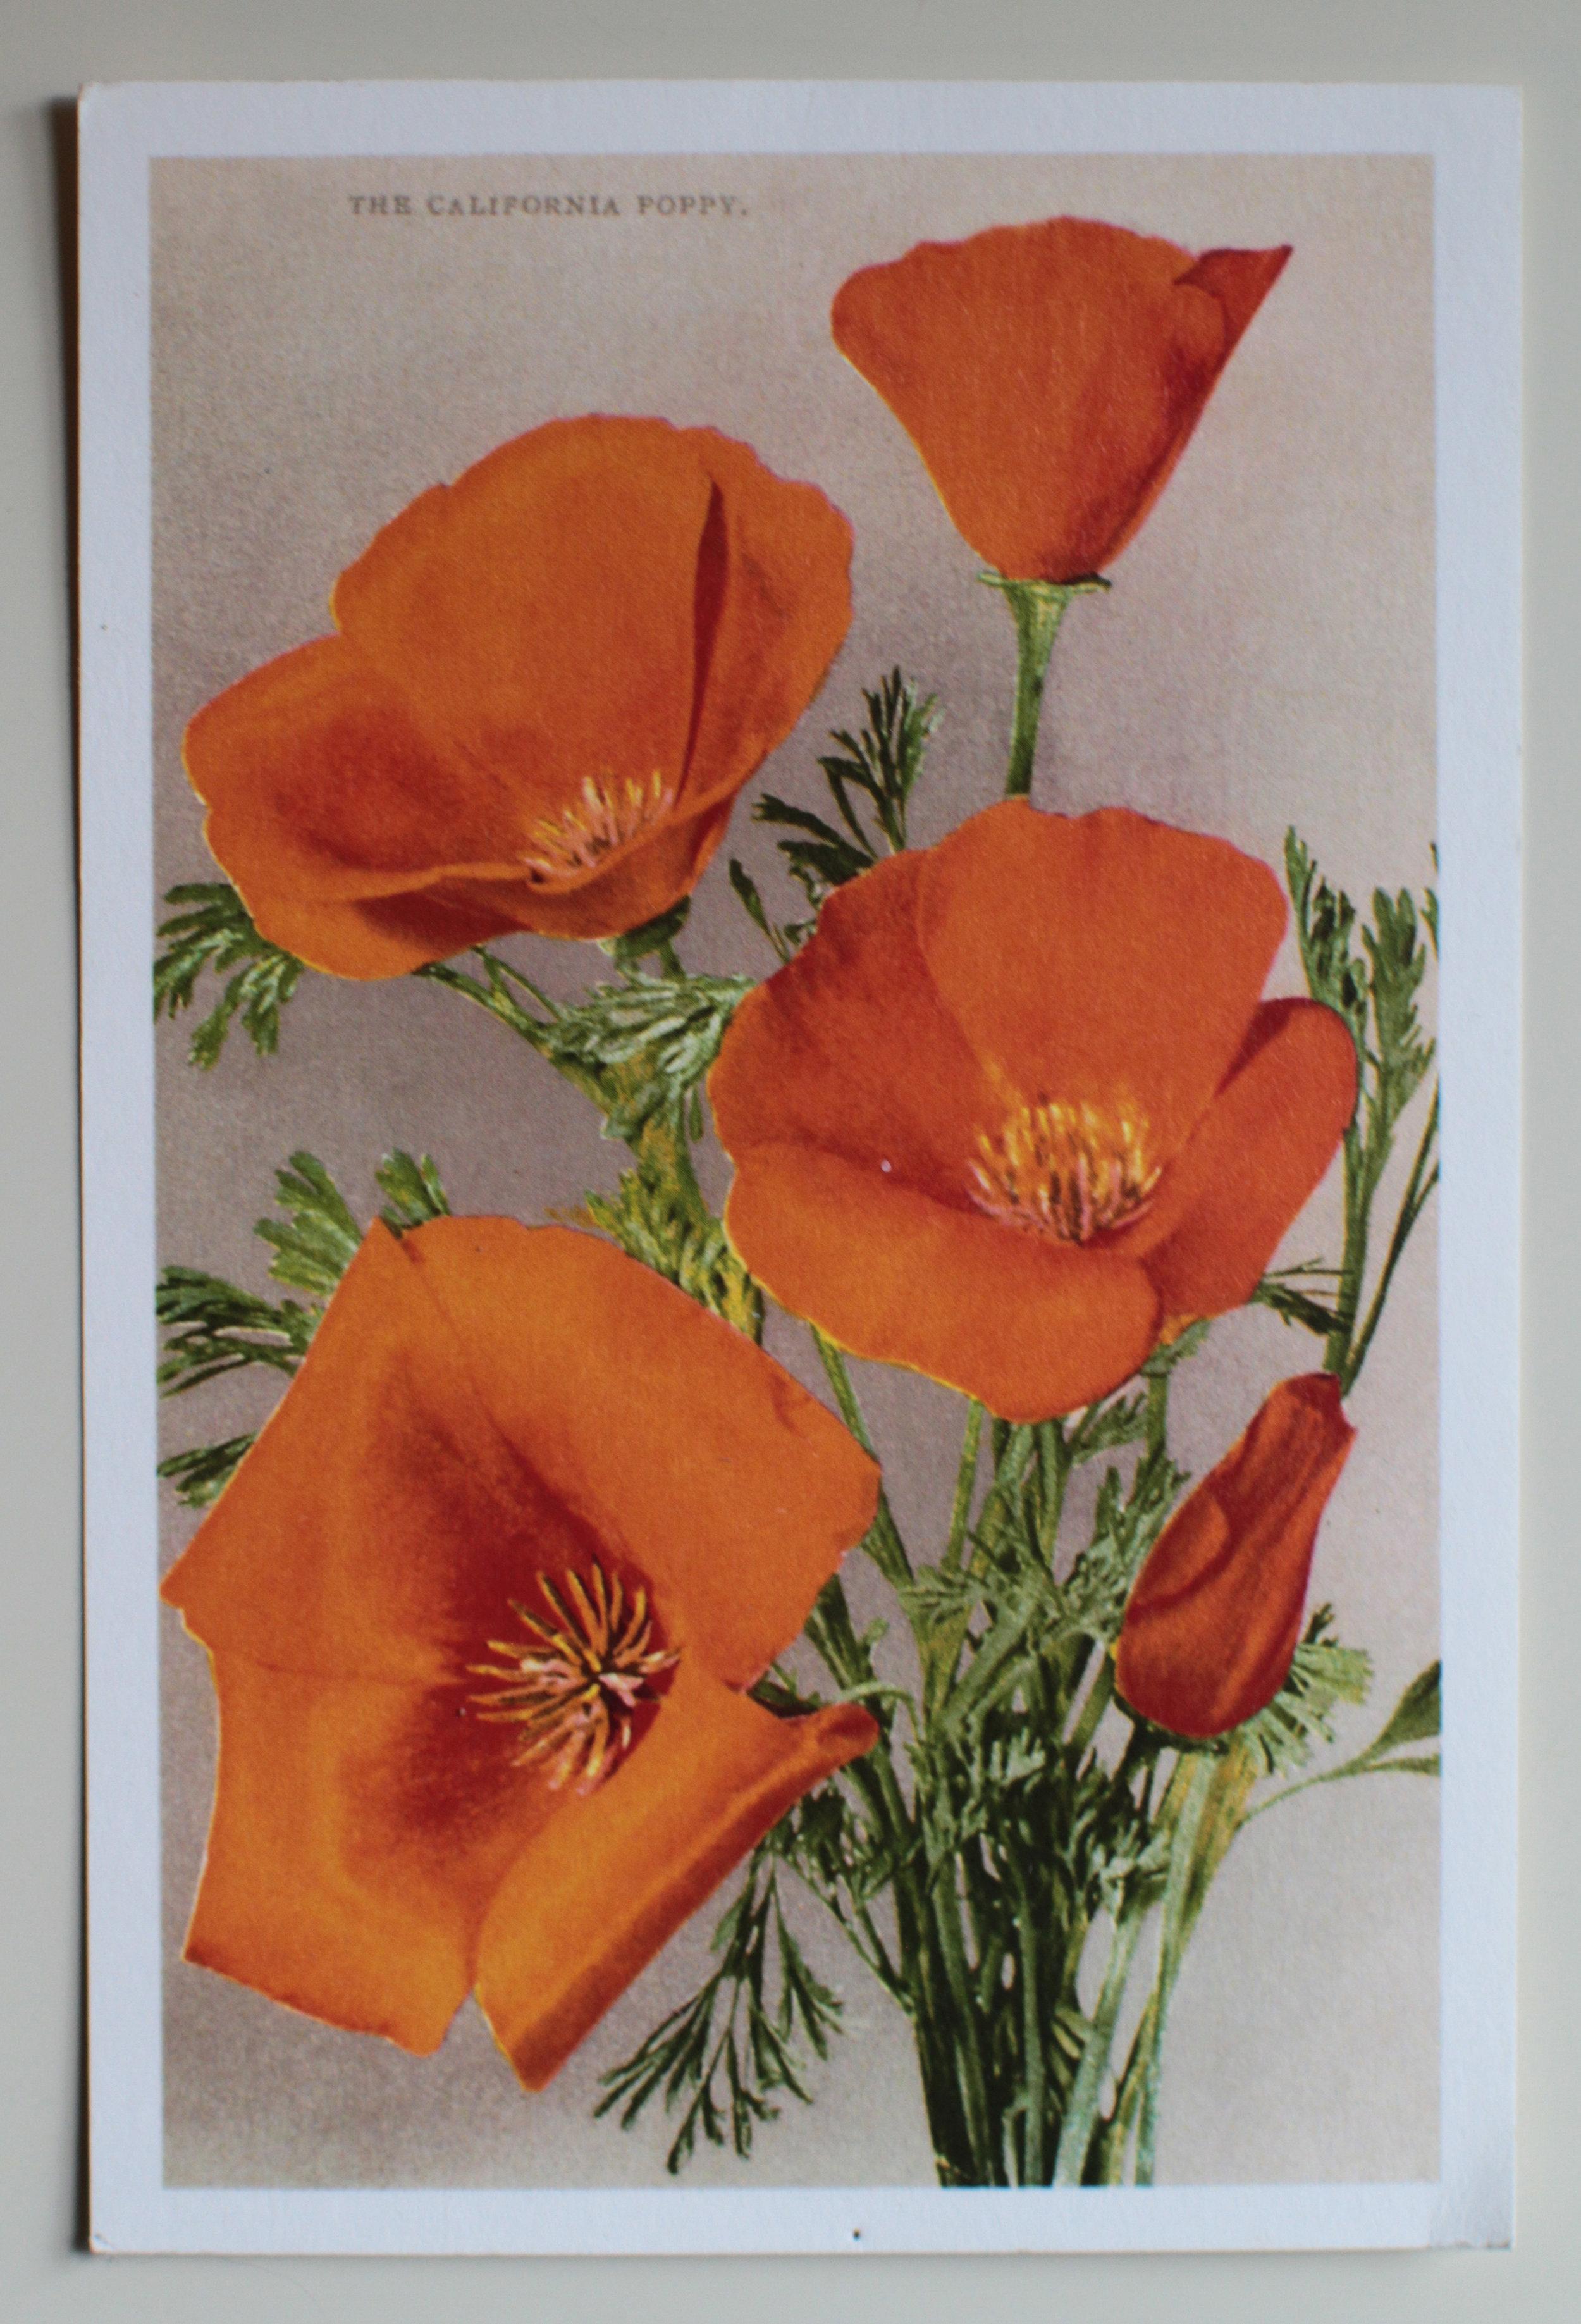 The California Poppy , a Muir Woods postcard